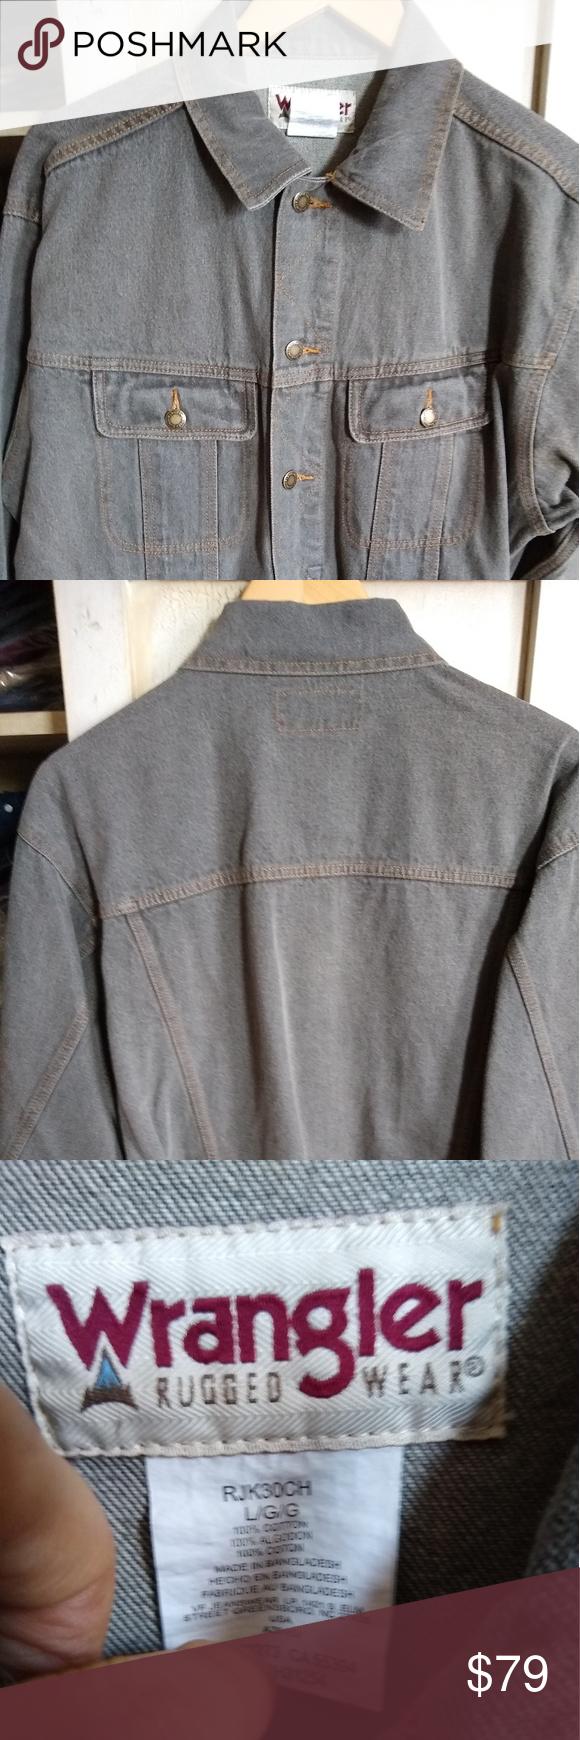 Wrangler Rugged Wear Denim Jacket 100 Denim Jacket In Moss Color Wrangler Jackets Coats Clothes Design How To Wear Fashion [ 1740 x 580 Pixel ]